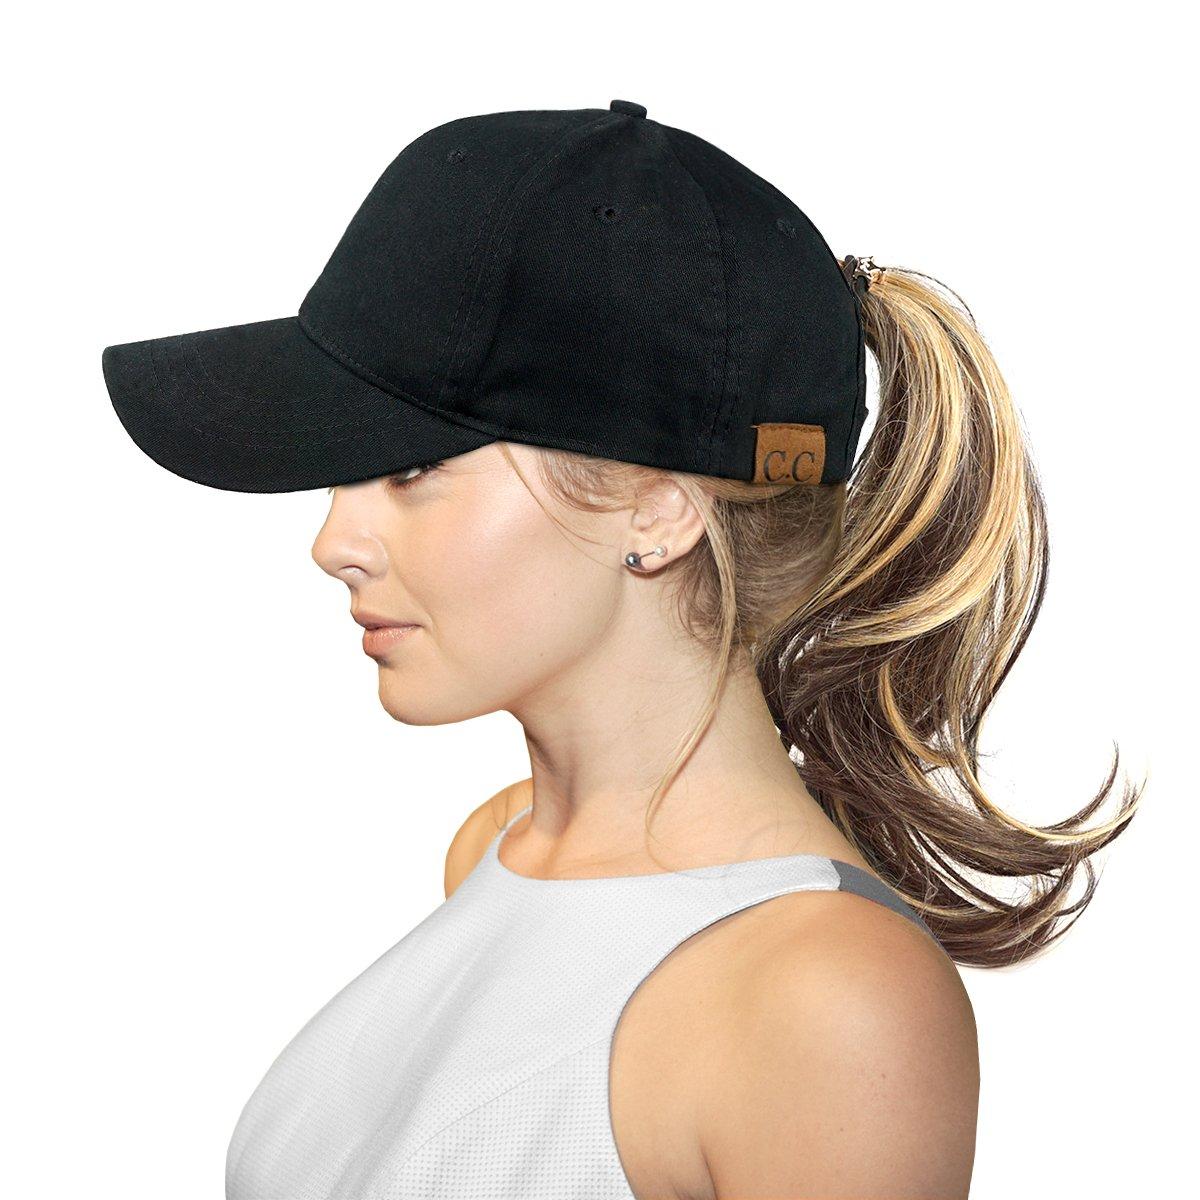 FADA Girl's Messy High Bun Ponytail Baseball Cap Cotton Ponycap Trucker Hat for Women